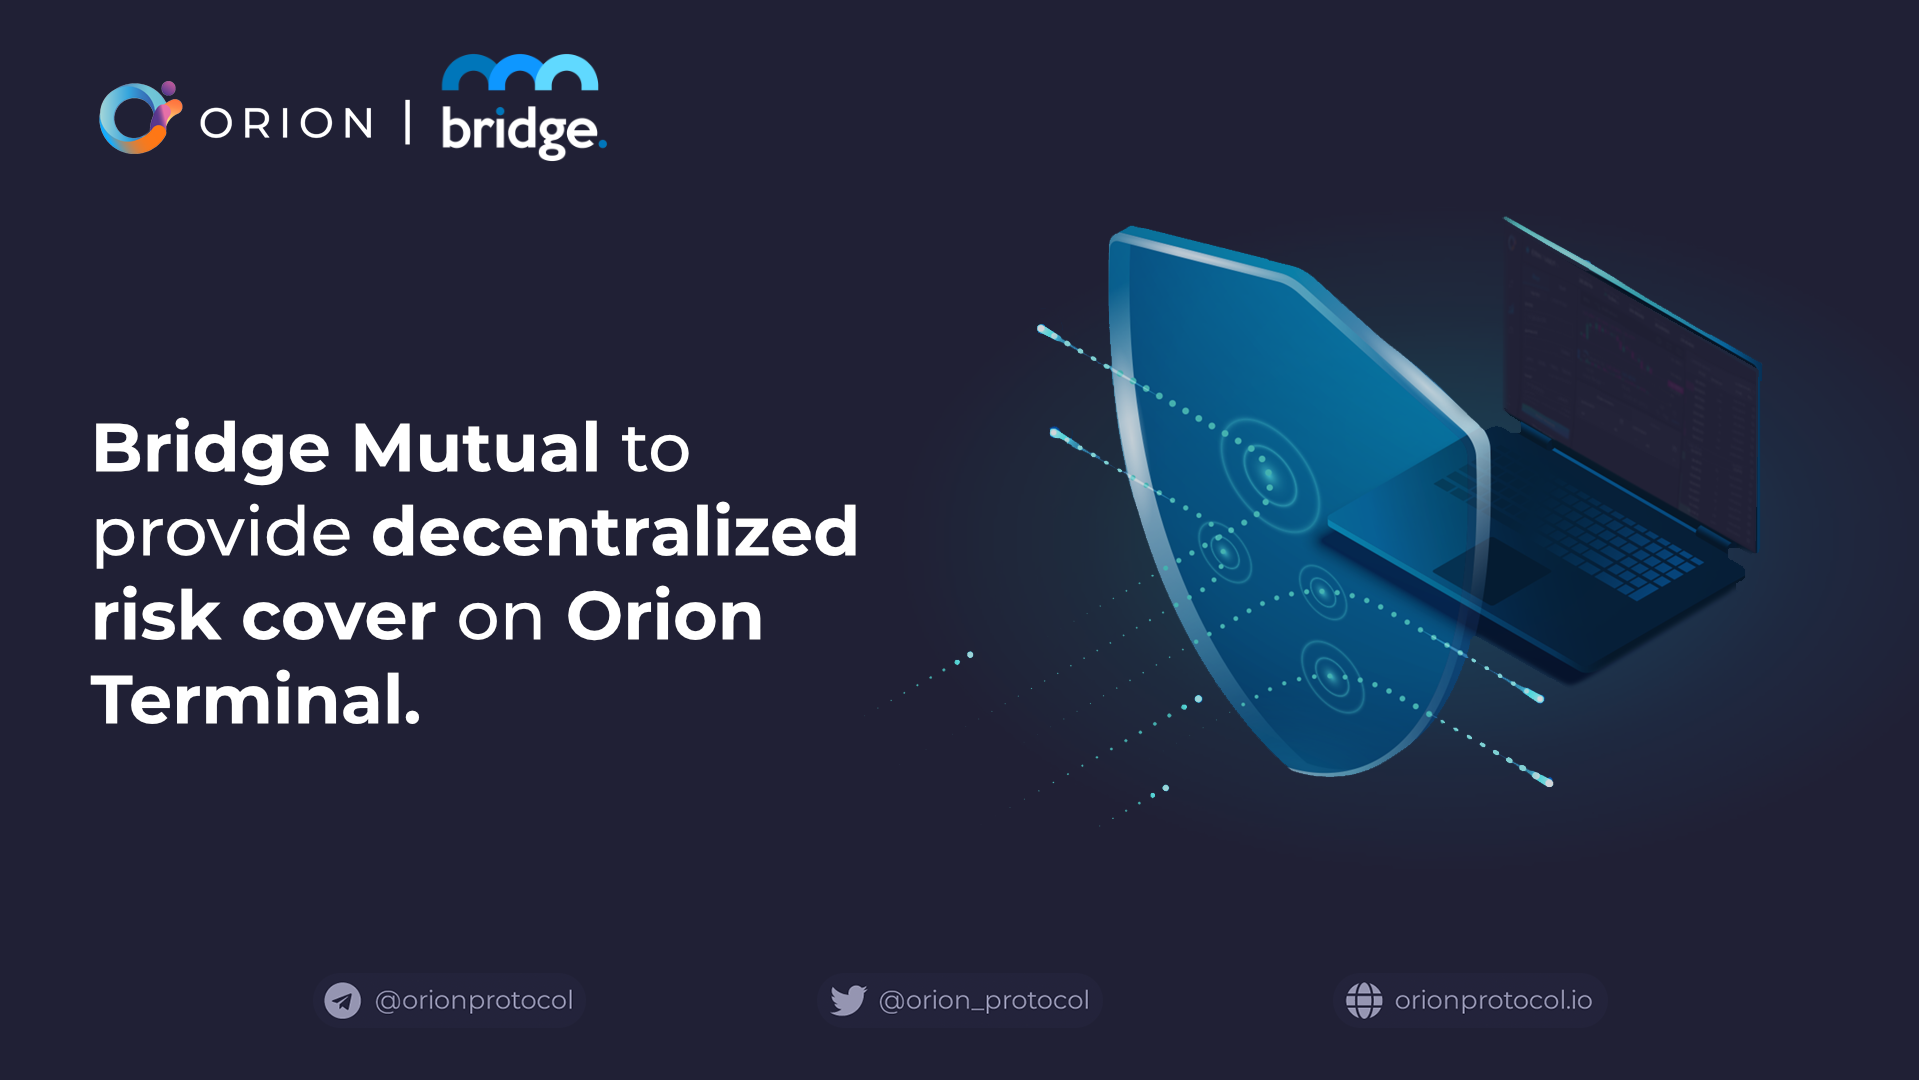 BridgeMutual brings additional insurance to Orion Terminal